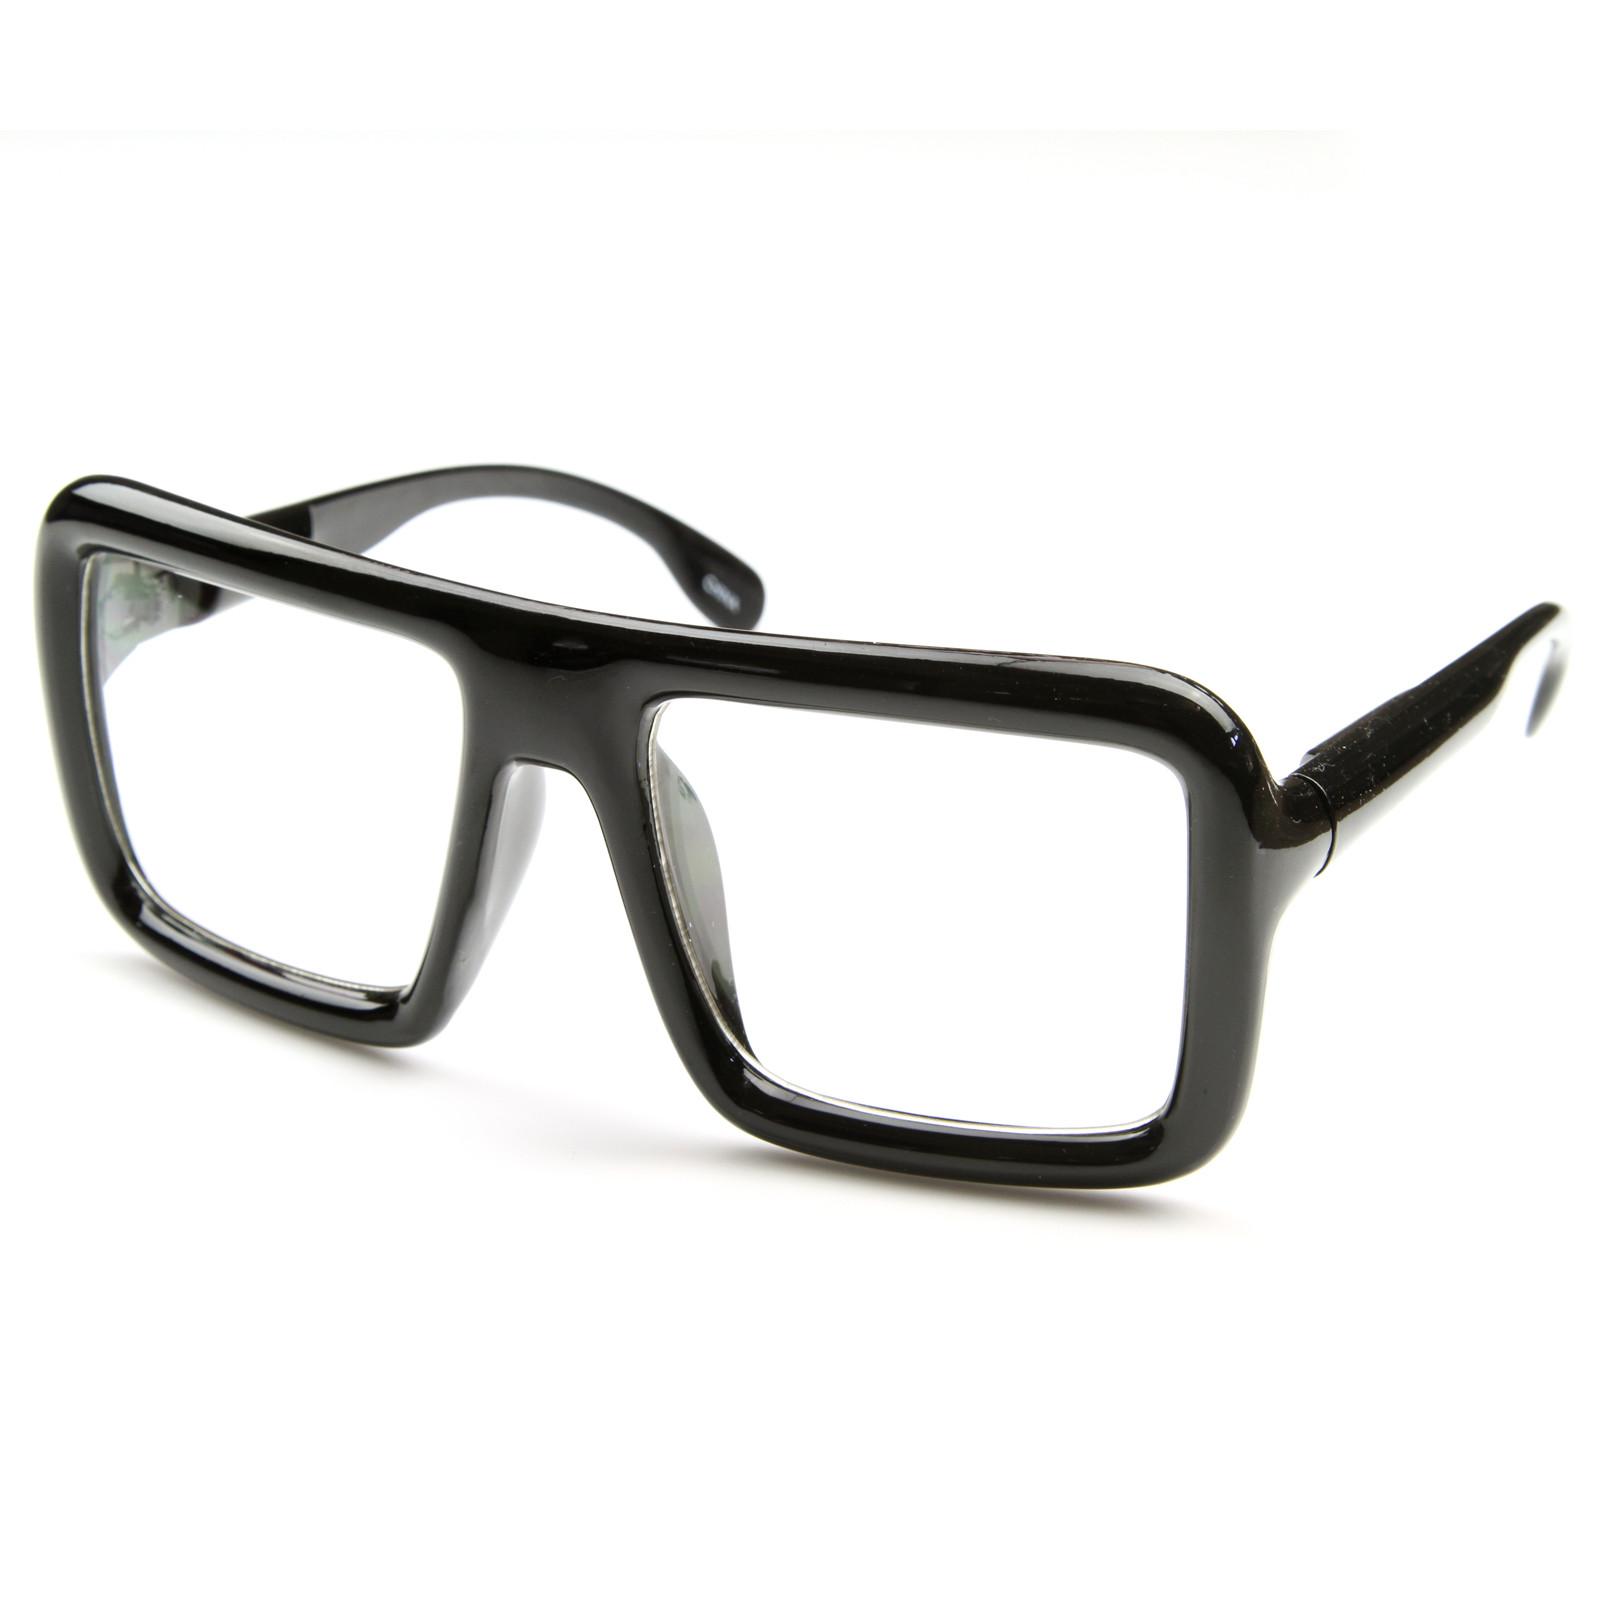 Oversize square block thick frame clear lens glasses 8548 zerouv oversize square block thick frame clear lens glasses 8548 jeuxipadfo Images